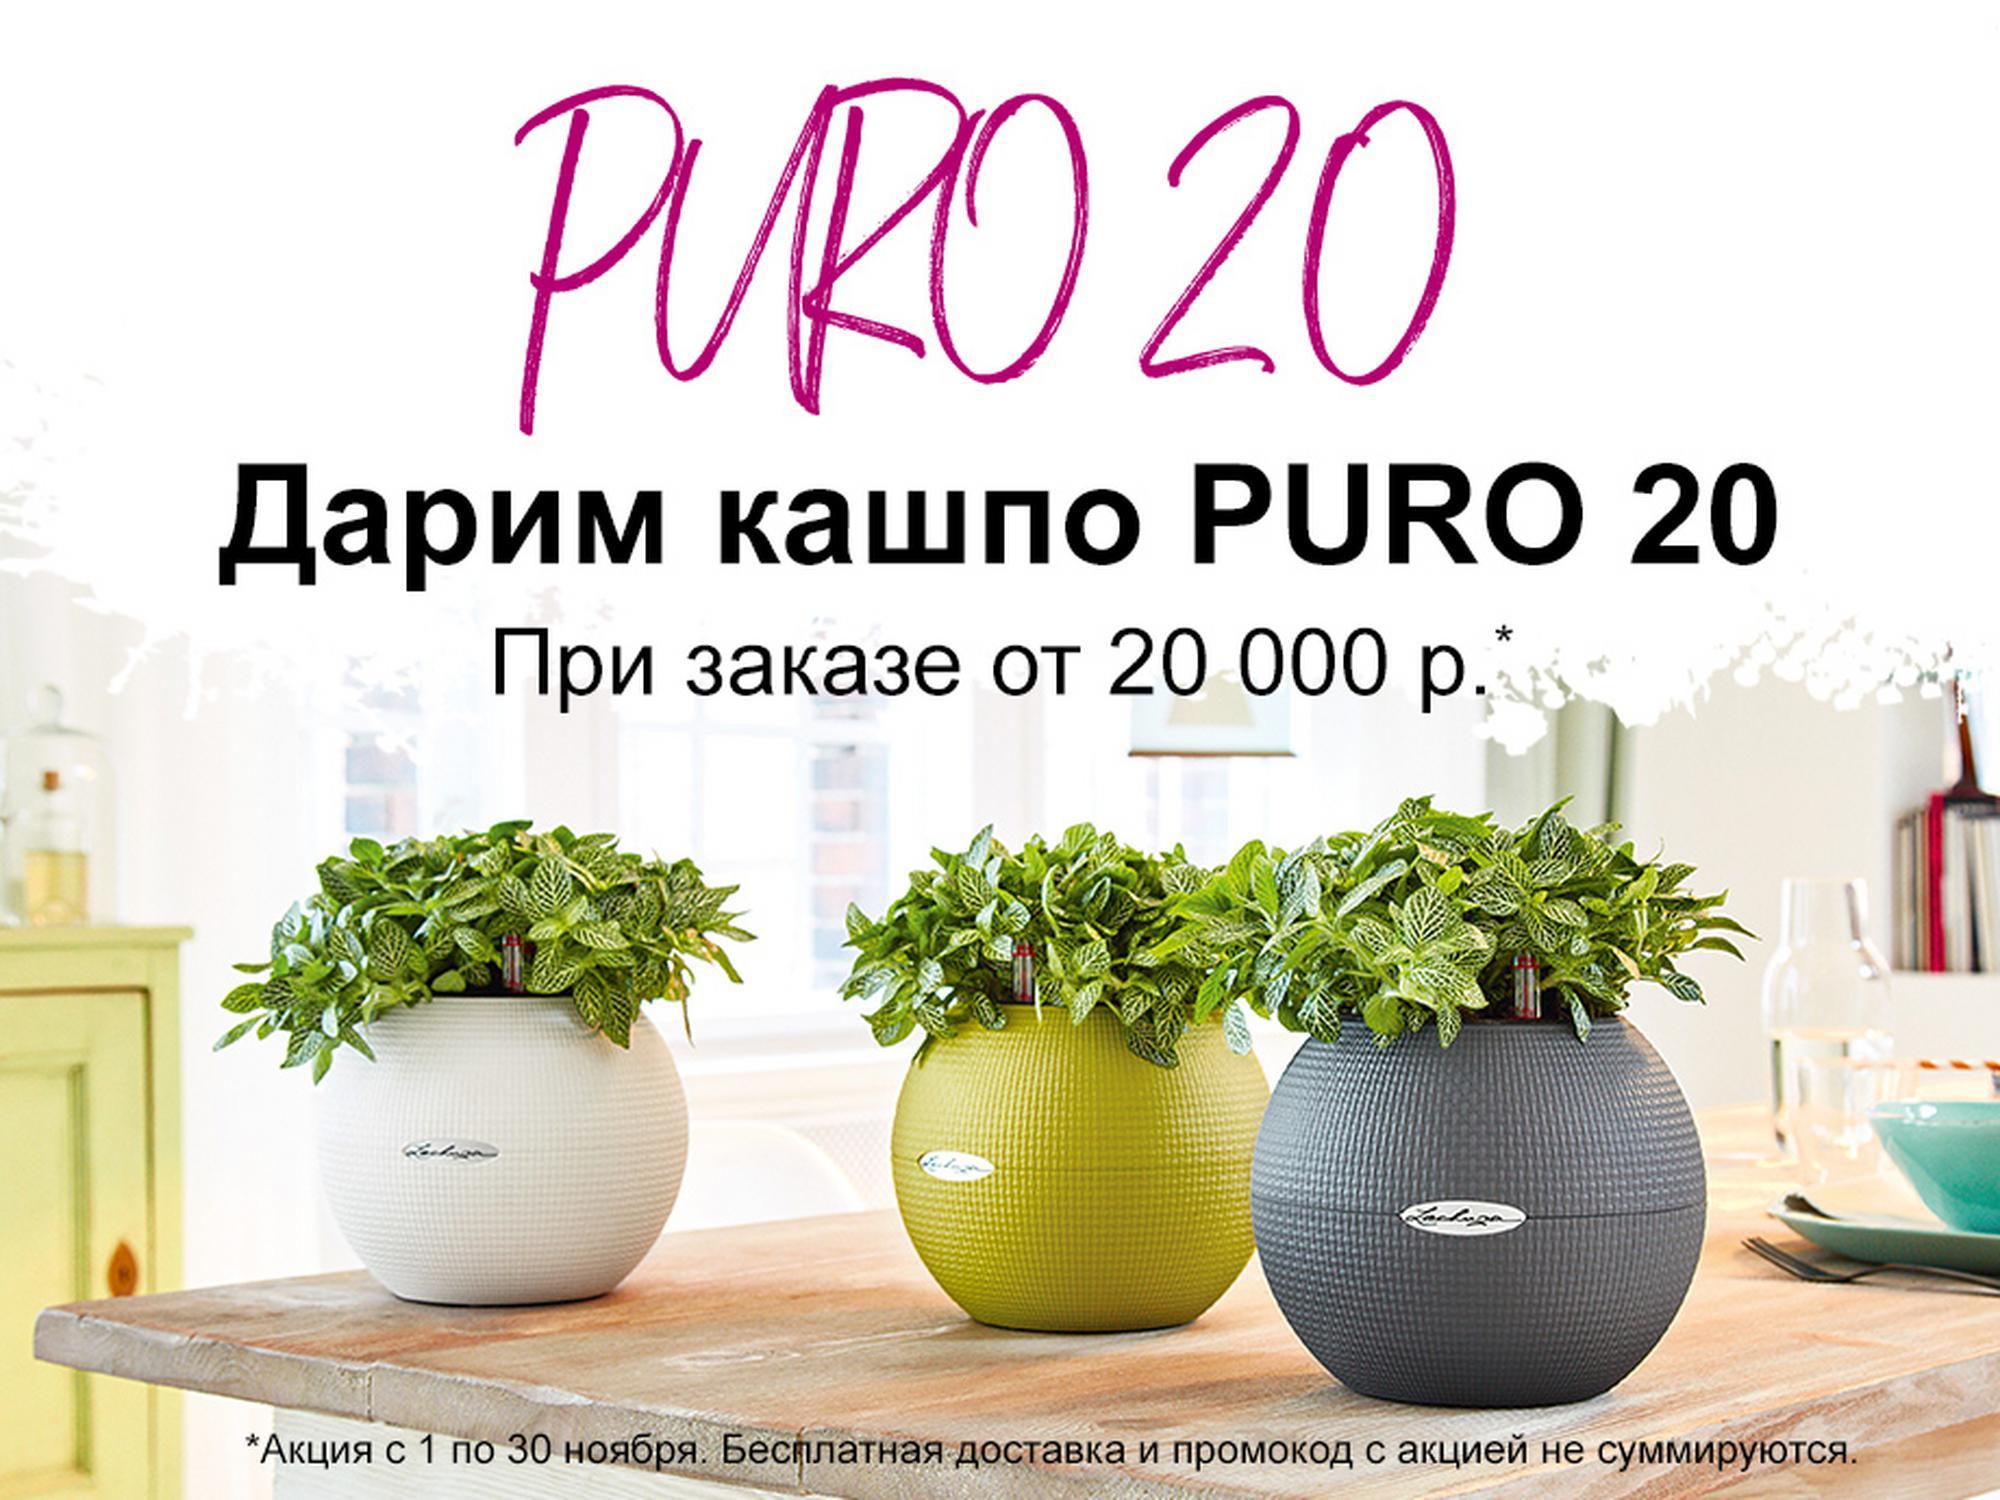 hero_banner_promo11-2019_xs_ru